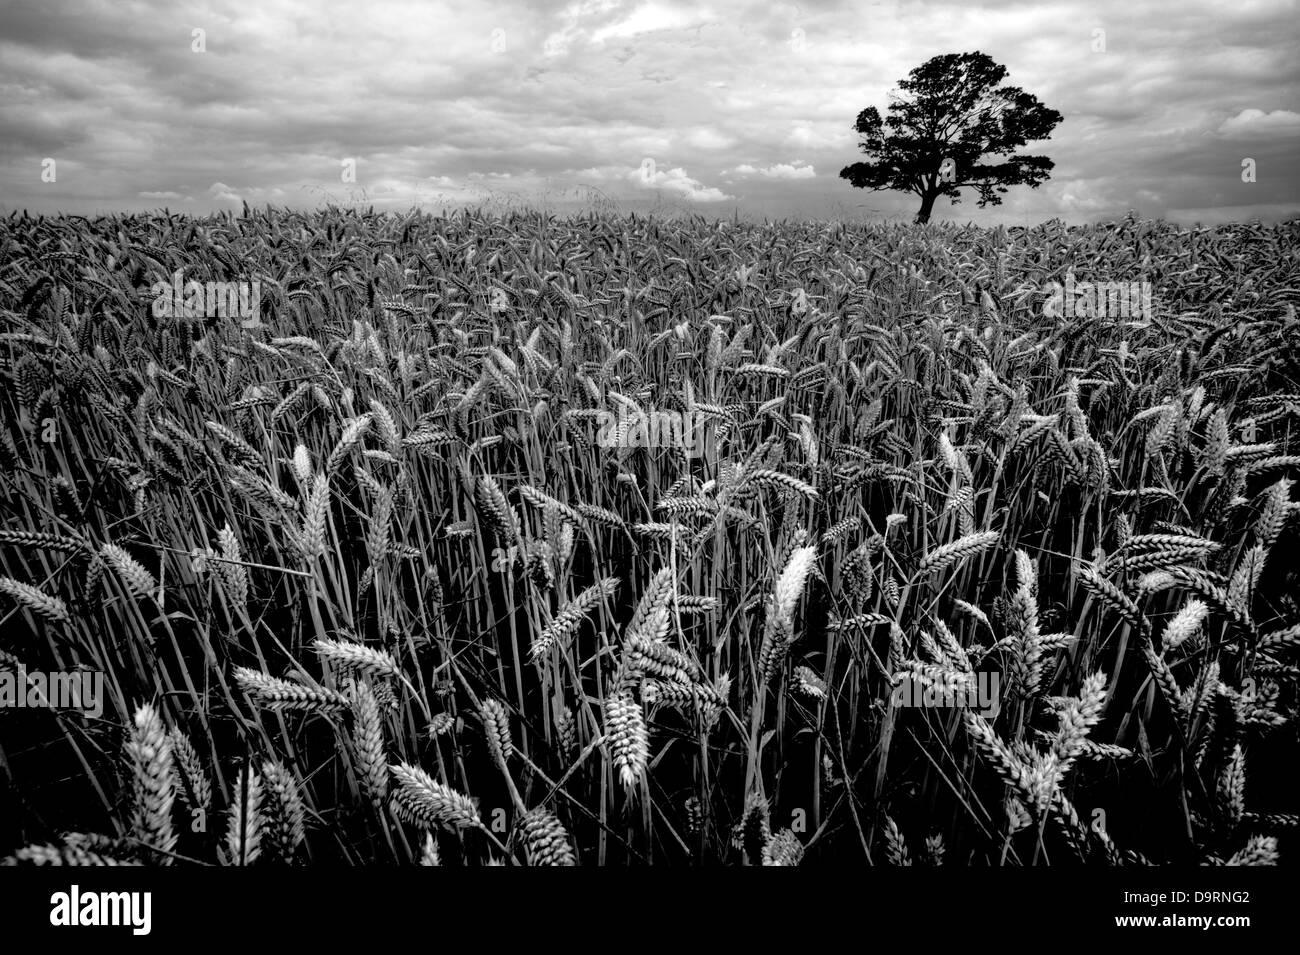 crop of corn Wheat field, Cumbria, Lake District national park, UK, England - Stock Image